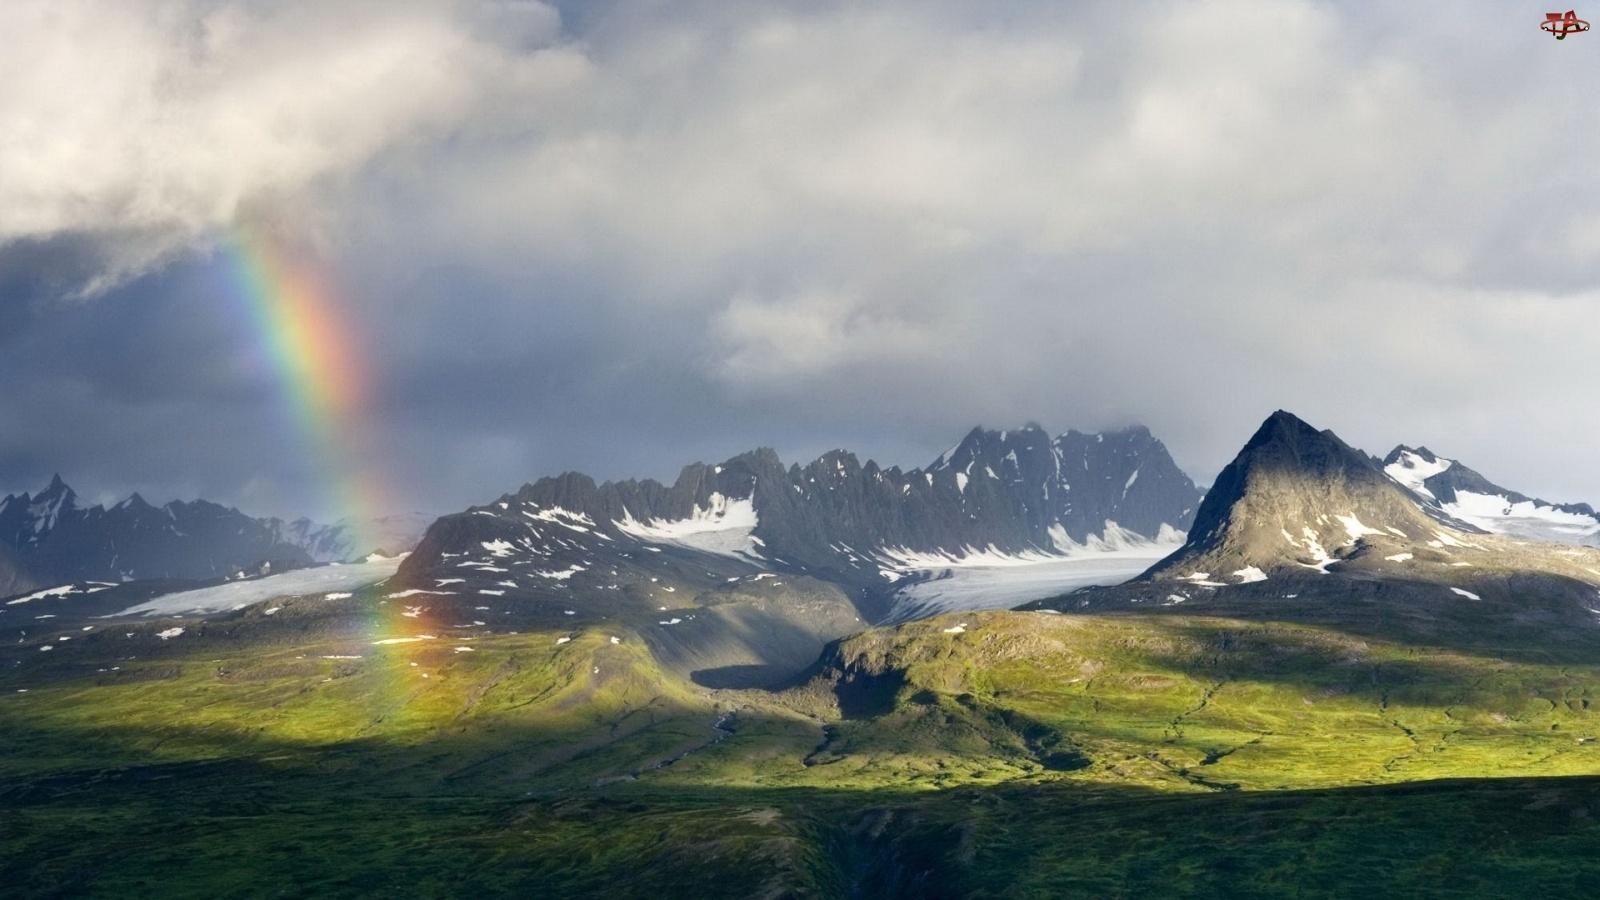 Tęcza, Góry, Doliny